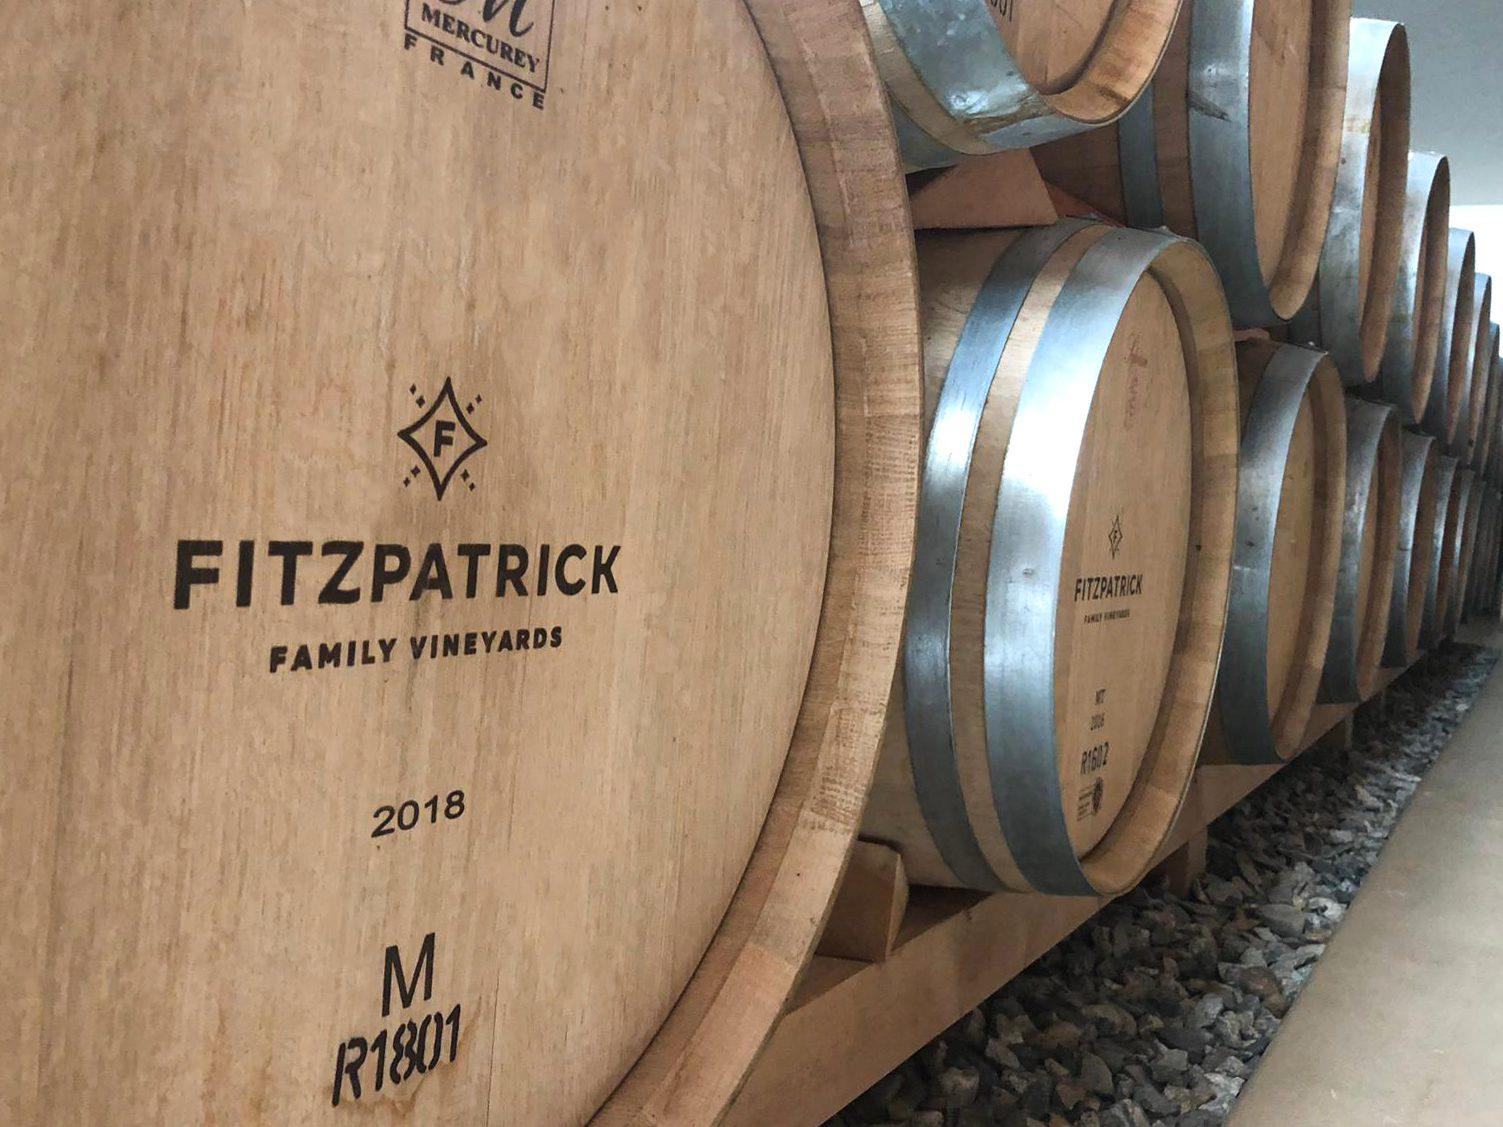 Fitzpatrick Vineyards